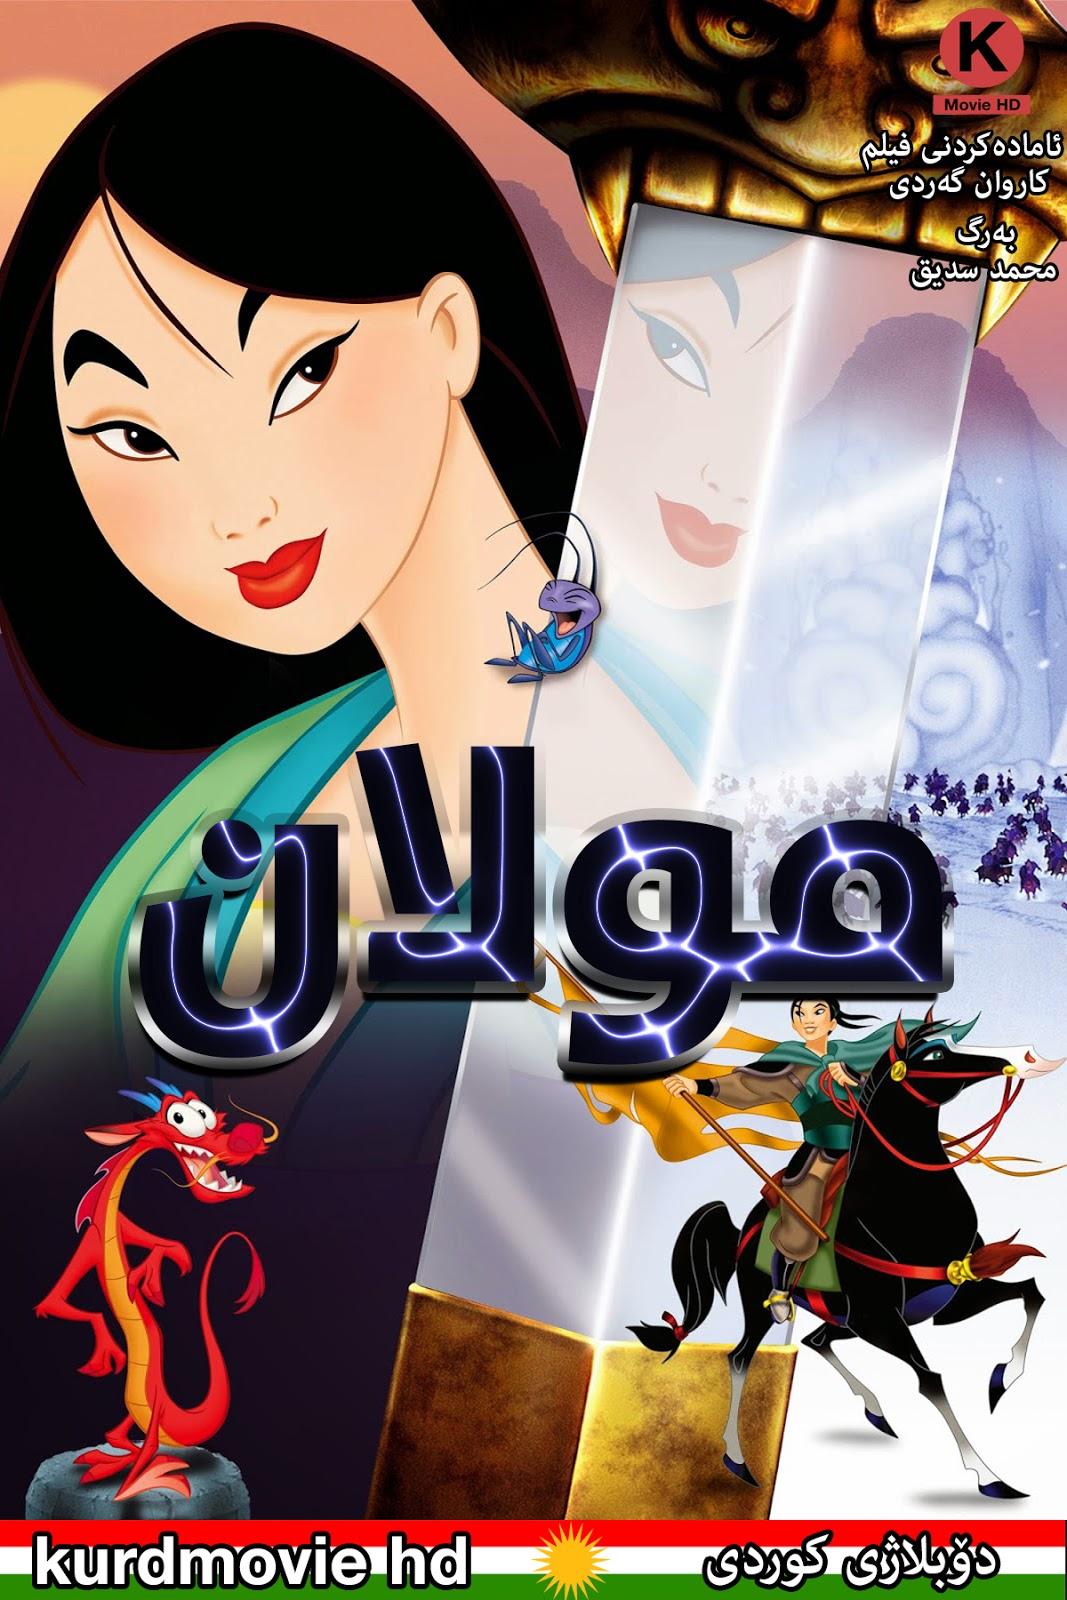 فیلم كارتۆنی دۆبلاژكراوی كوردی مولان Mulan 1998